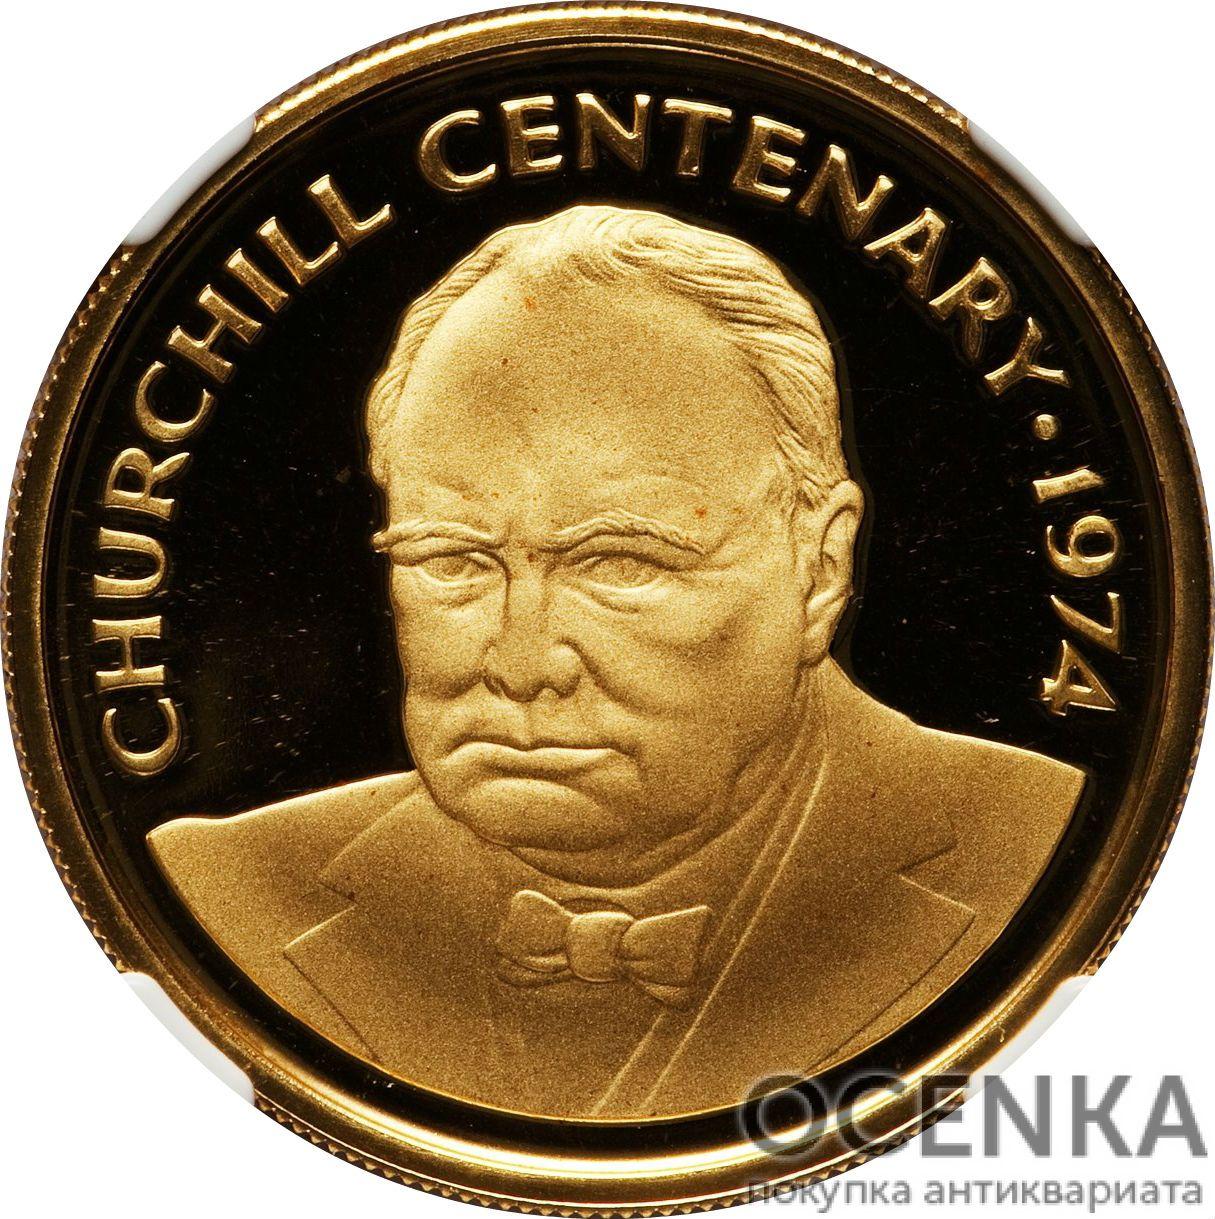 Золотая монета 100 Долларов Острова Кайман - 1